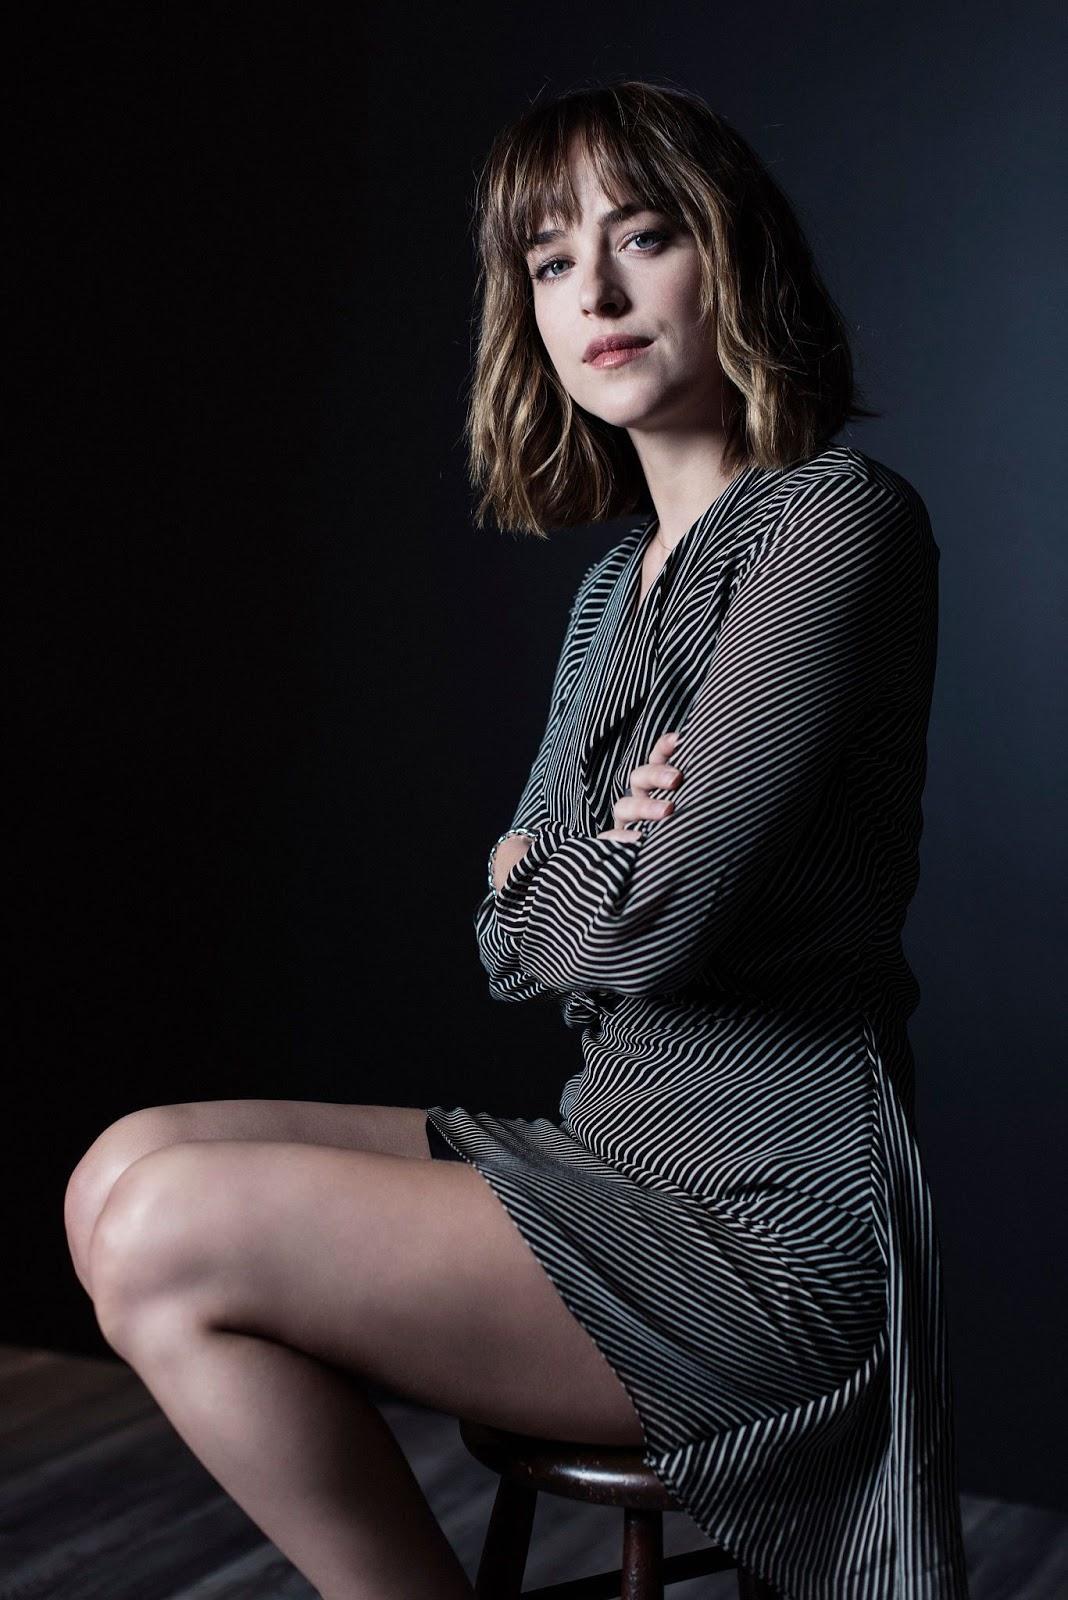 3 5 M To Feet New Hq Pictures Of Dakota S Photoshoot From Tiff Dakota